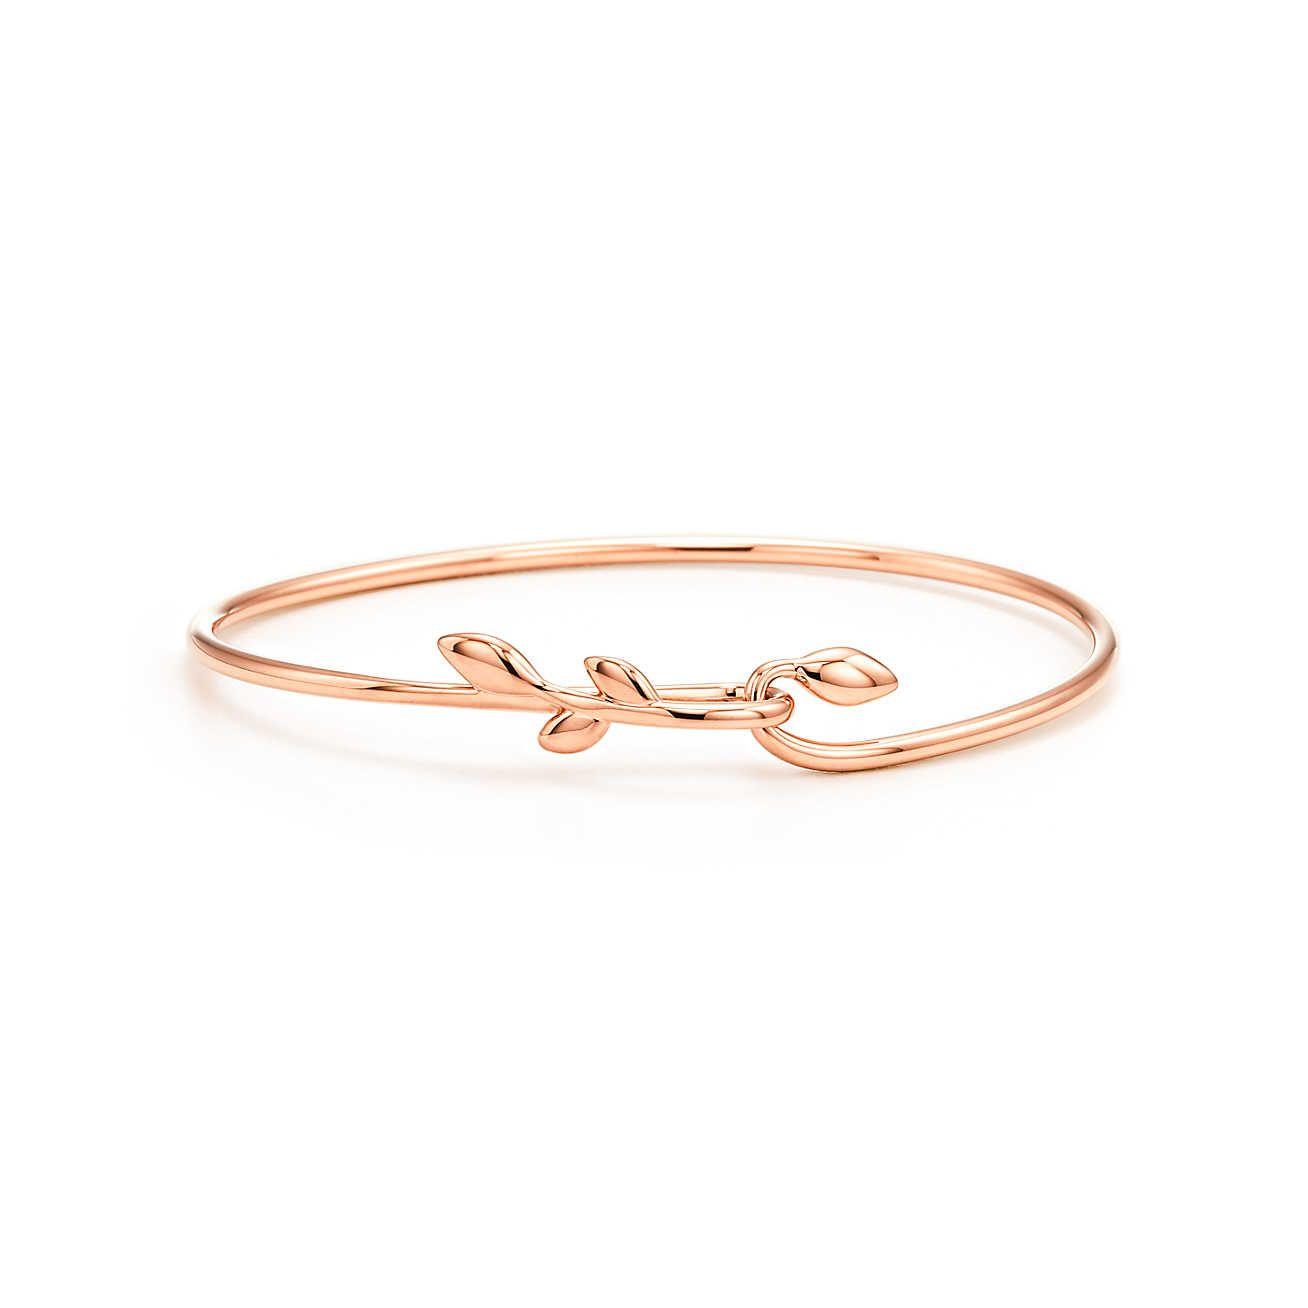 1855c6346 Paloma Picasso® Olive Leaf hook bangle in 18k rose gold, medium. | Tiffany  & Co.